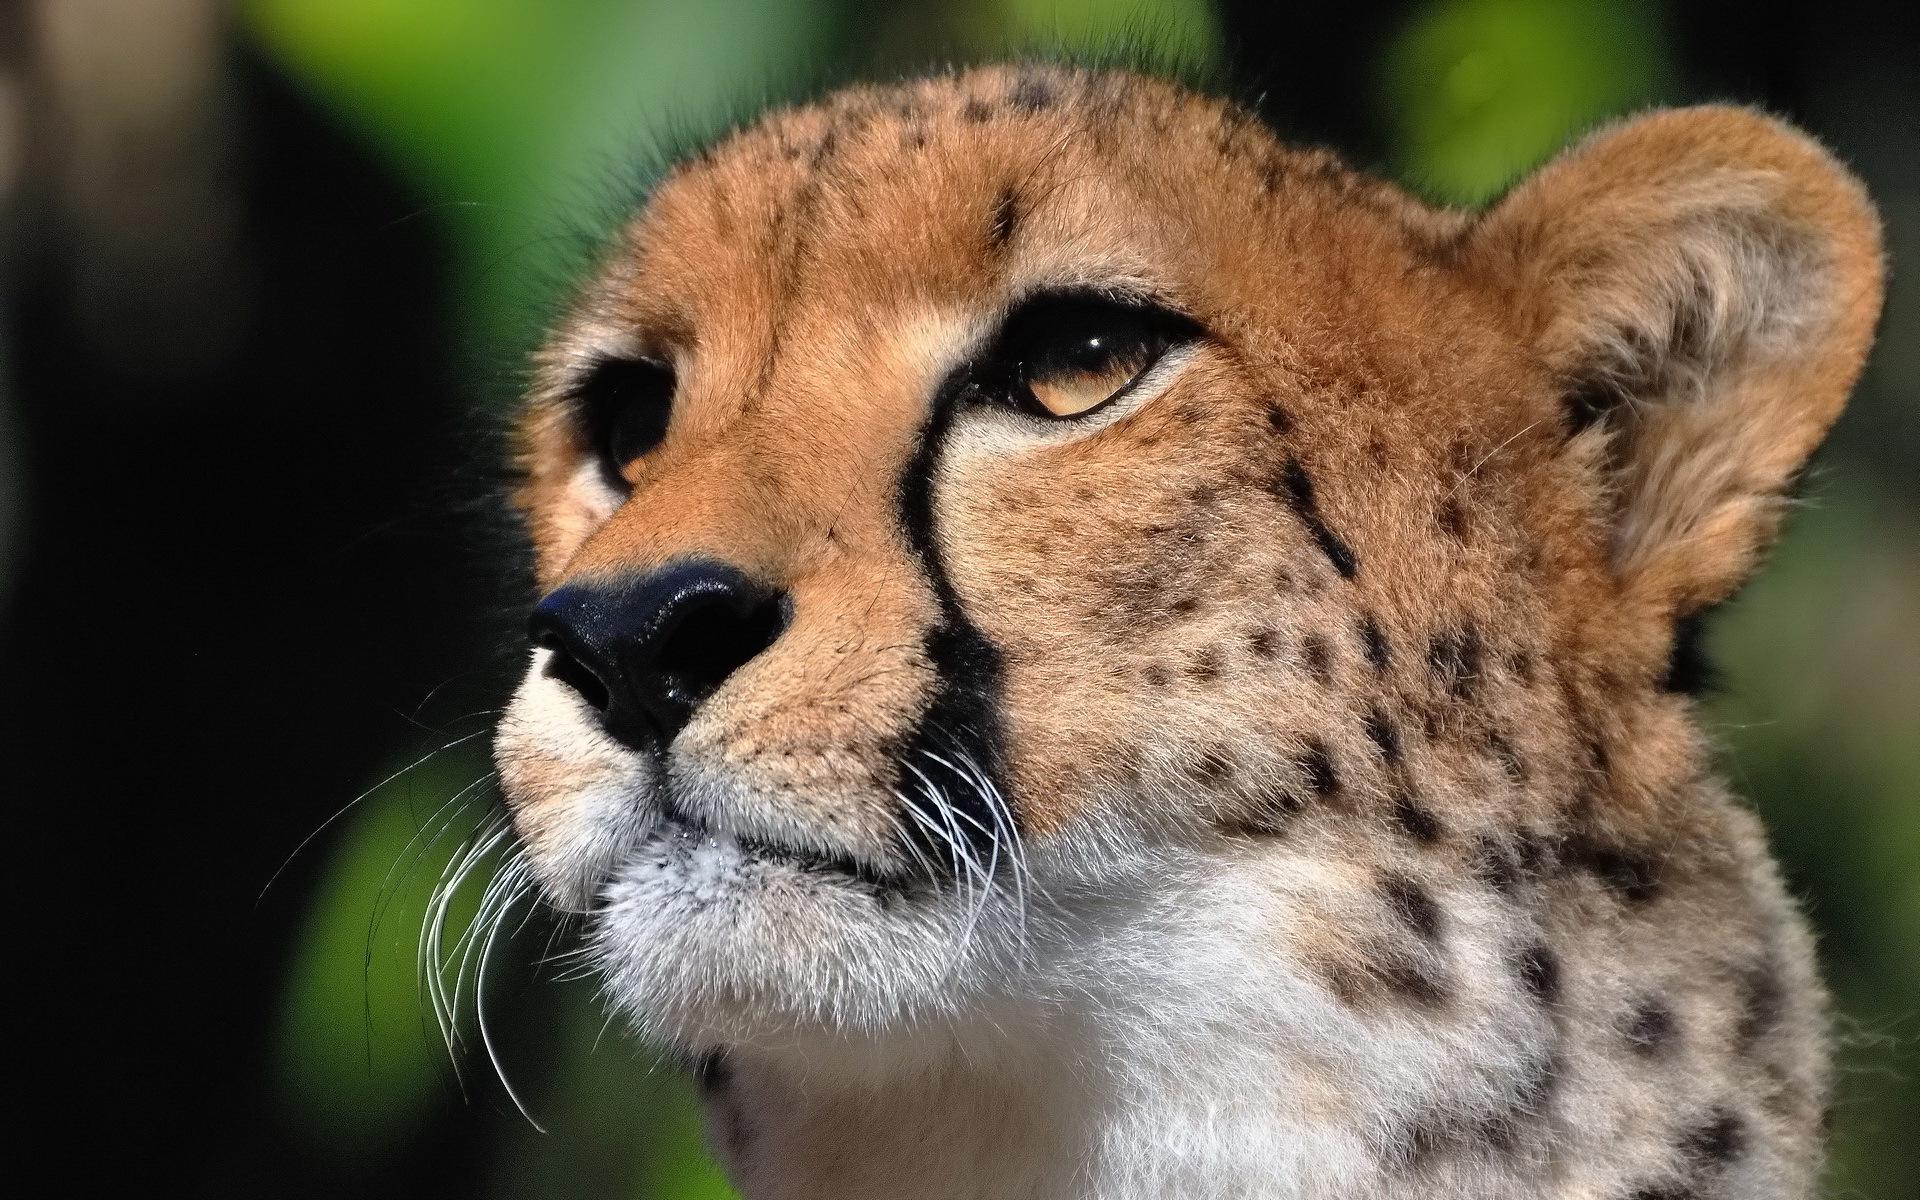 How Did India Lose The Cheetah? - WorldAtlas